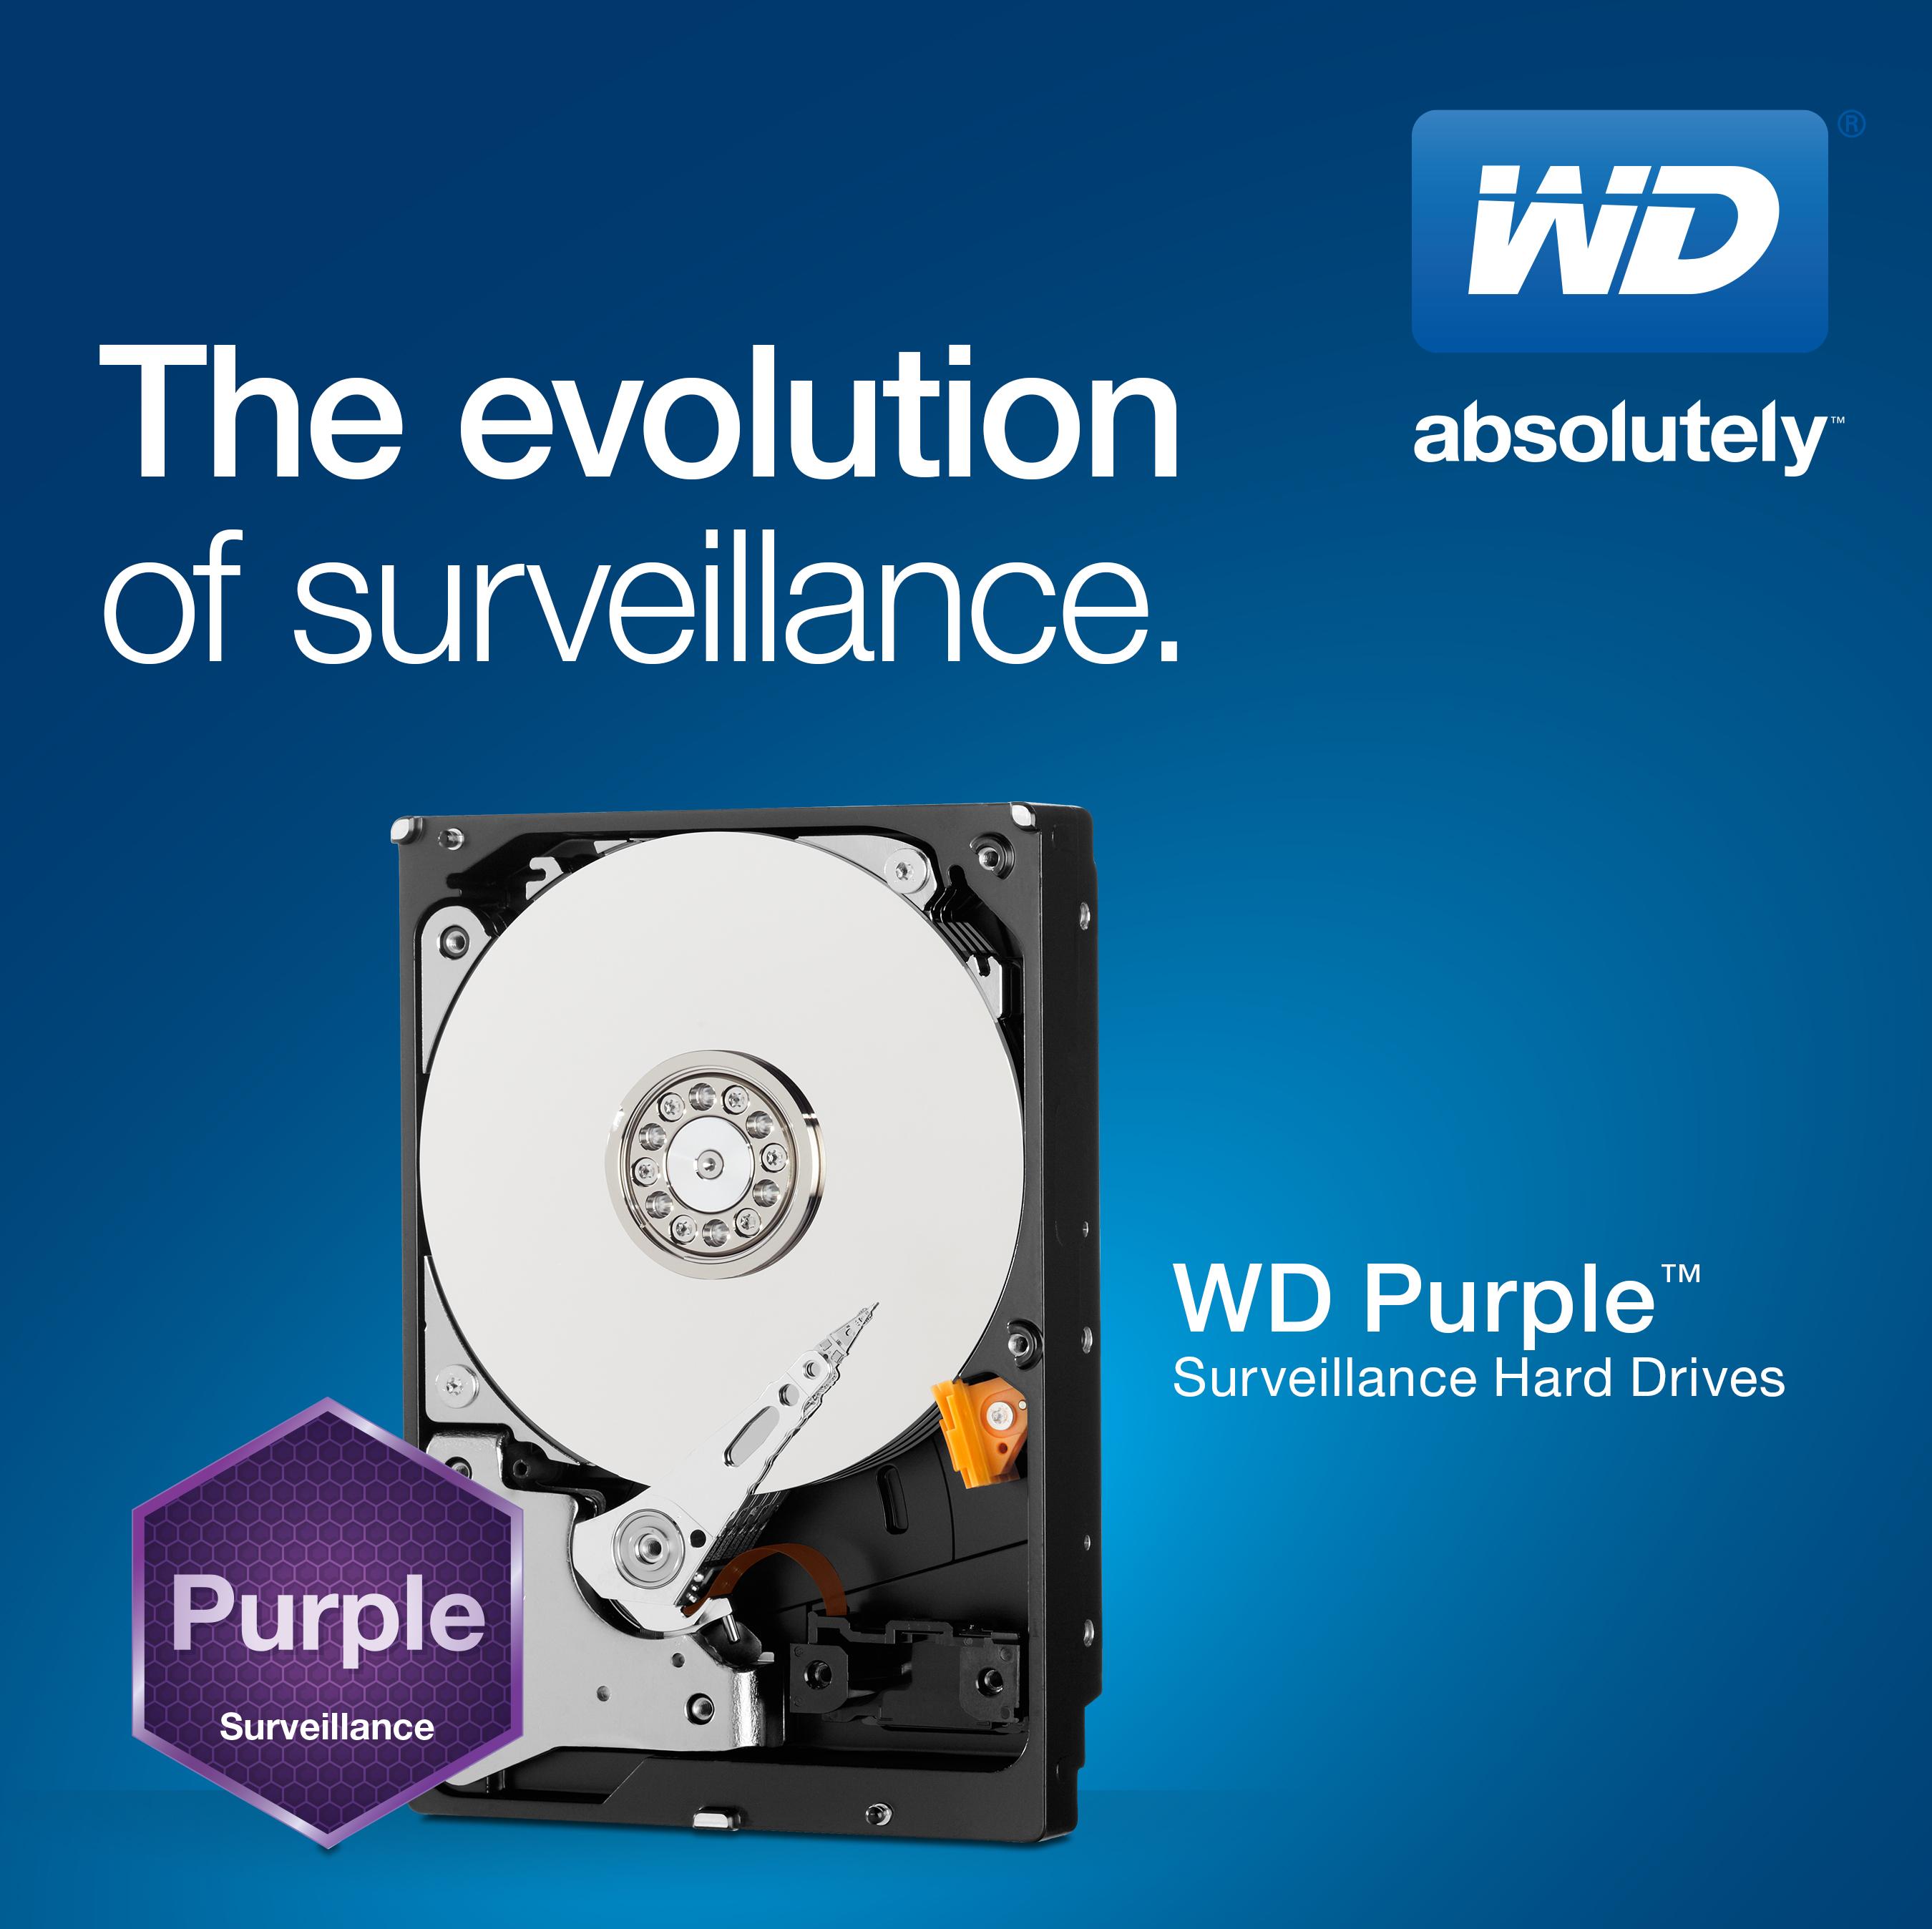 WD® DEBUTS The New WD Purple™ SURVEILLANCE-CLASS HARD DRIVE LINE